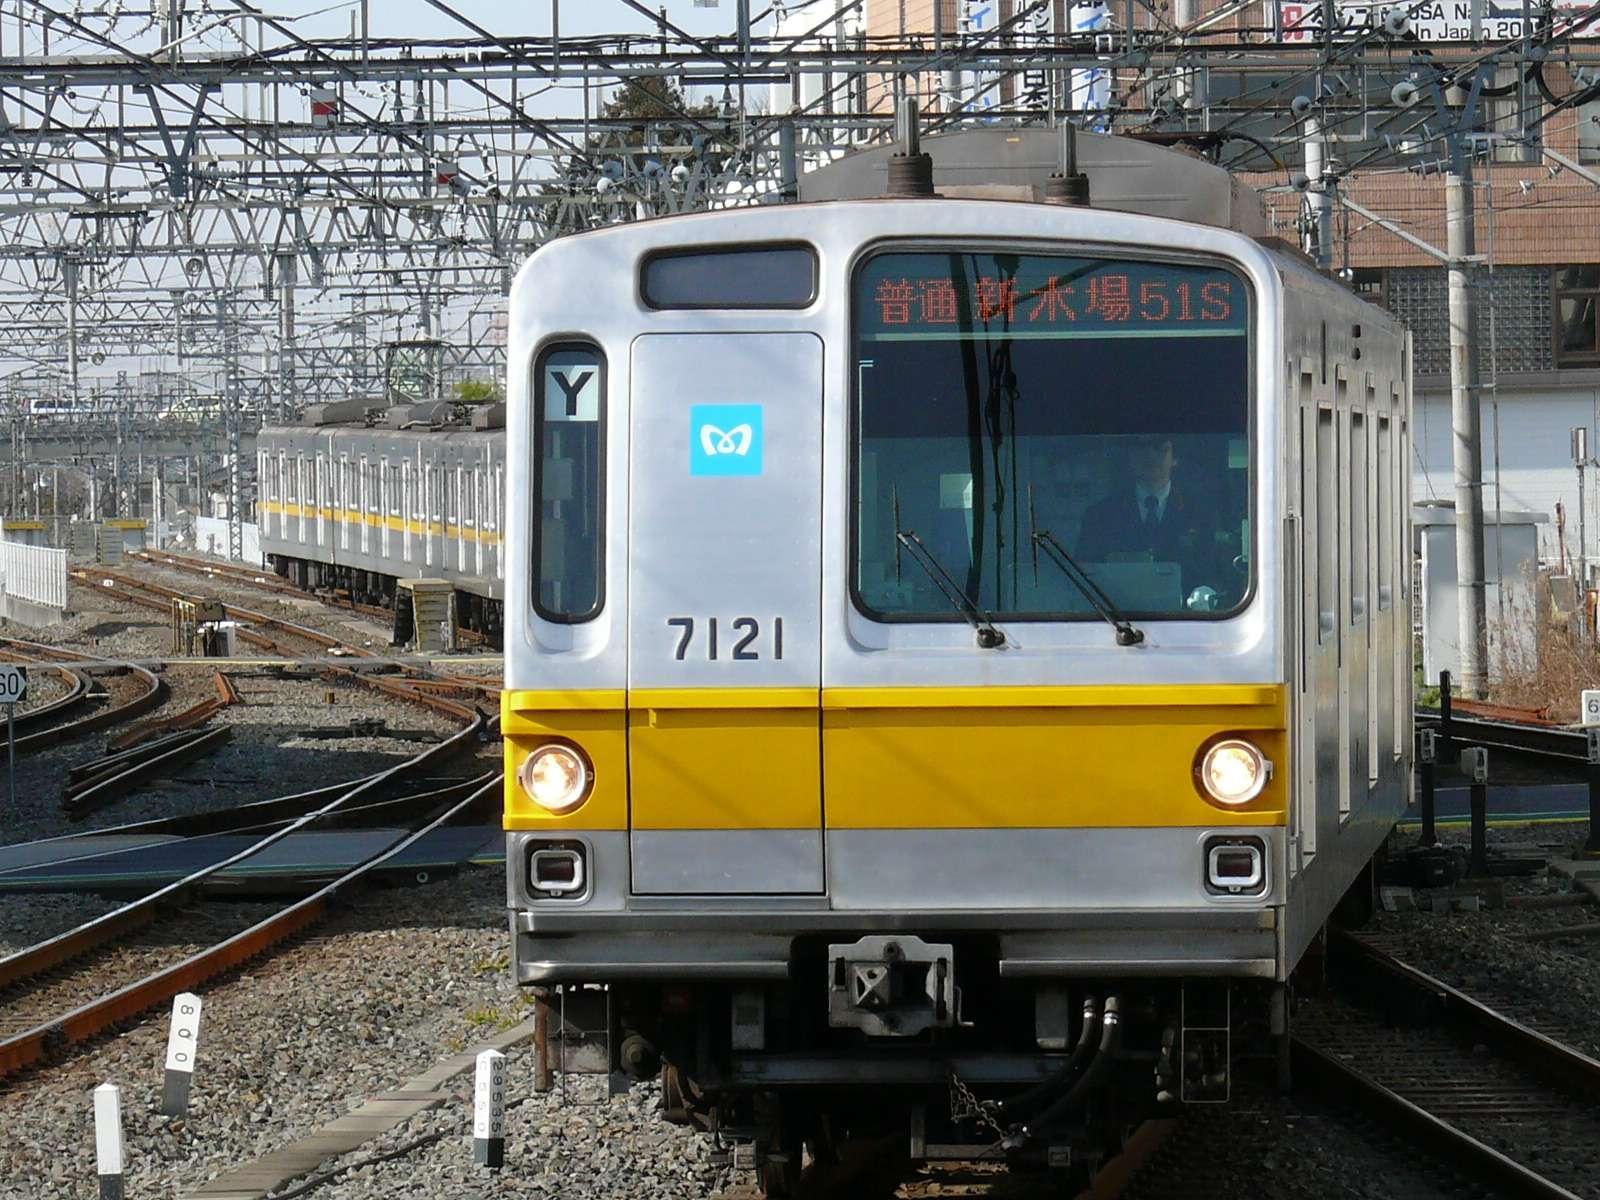 KRL 7121F di stasiun Kawagoeshi, 9 Februari 2009 (http://netrain.makibisi.net/trainphoto/tokyometro/7000.htm)